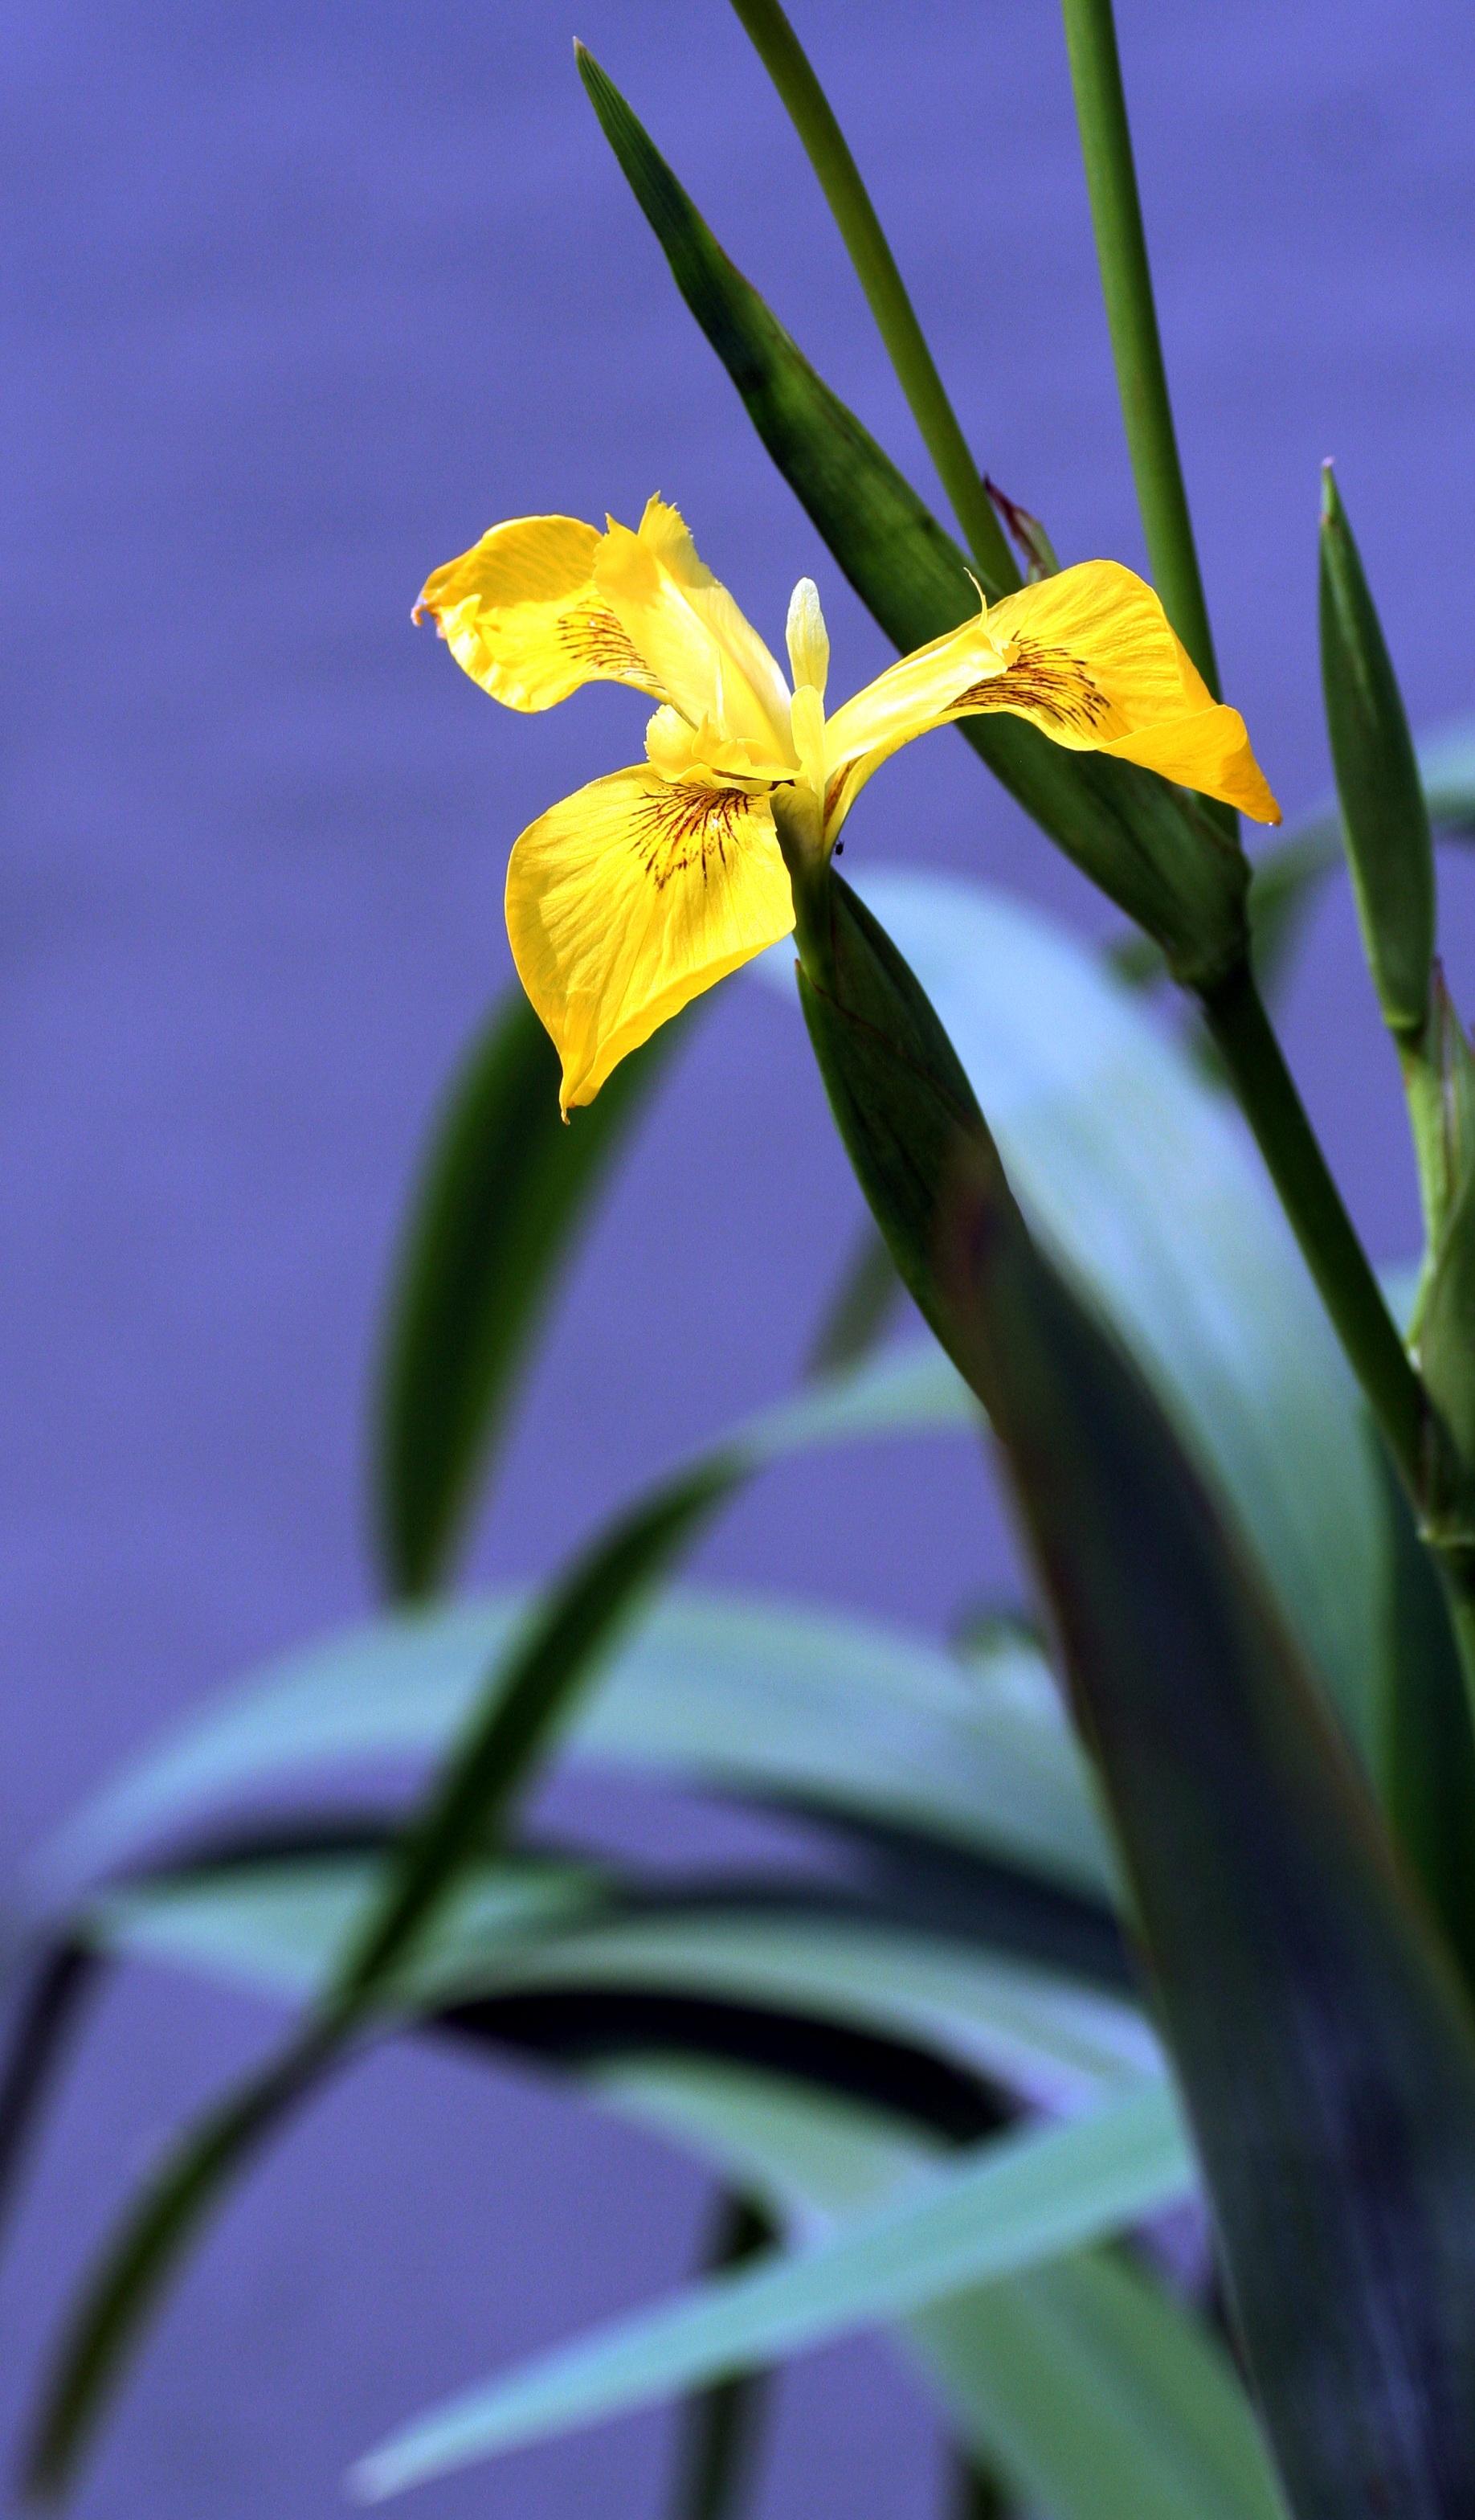 Free Images Marsh Leaf Petal River Botany Flora Yellow